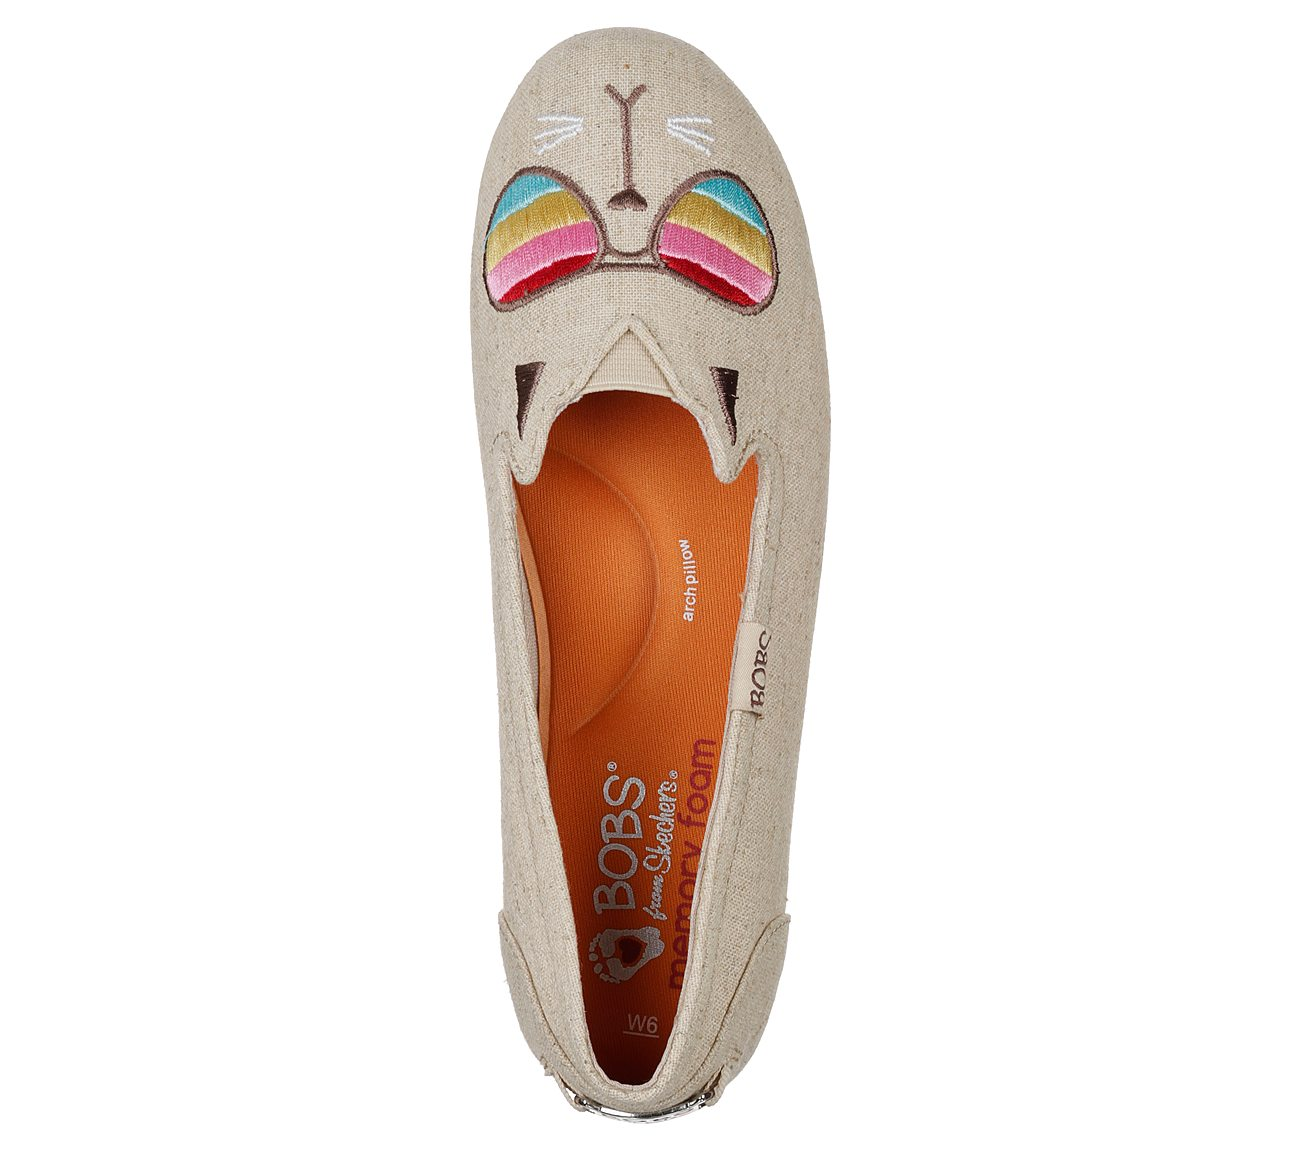 Skechers Bobs Schuhe Günstig Kaufen , BOBS Plush Kool Kat